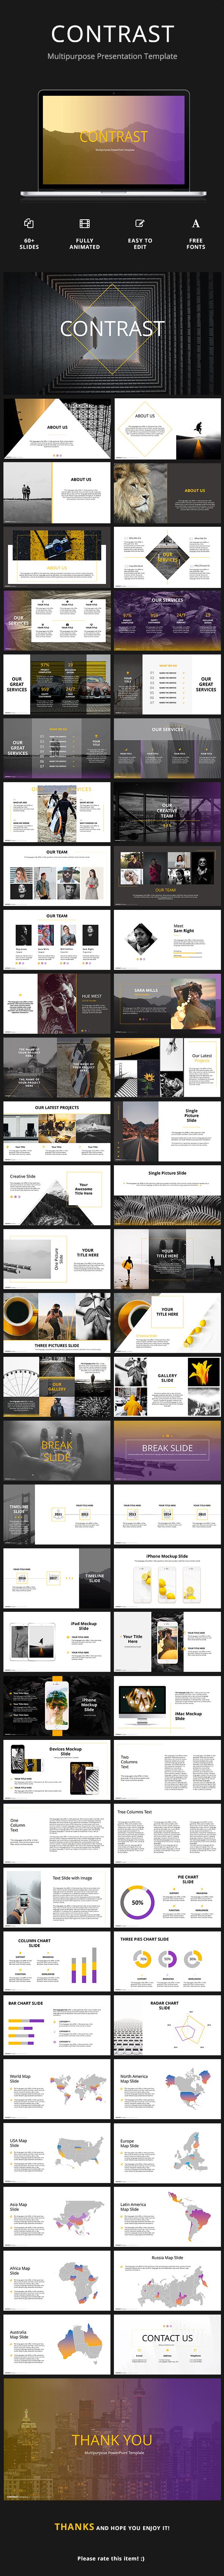 Contrast - Creative Google Slides Template - Google Slides Presentation Templates